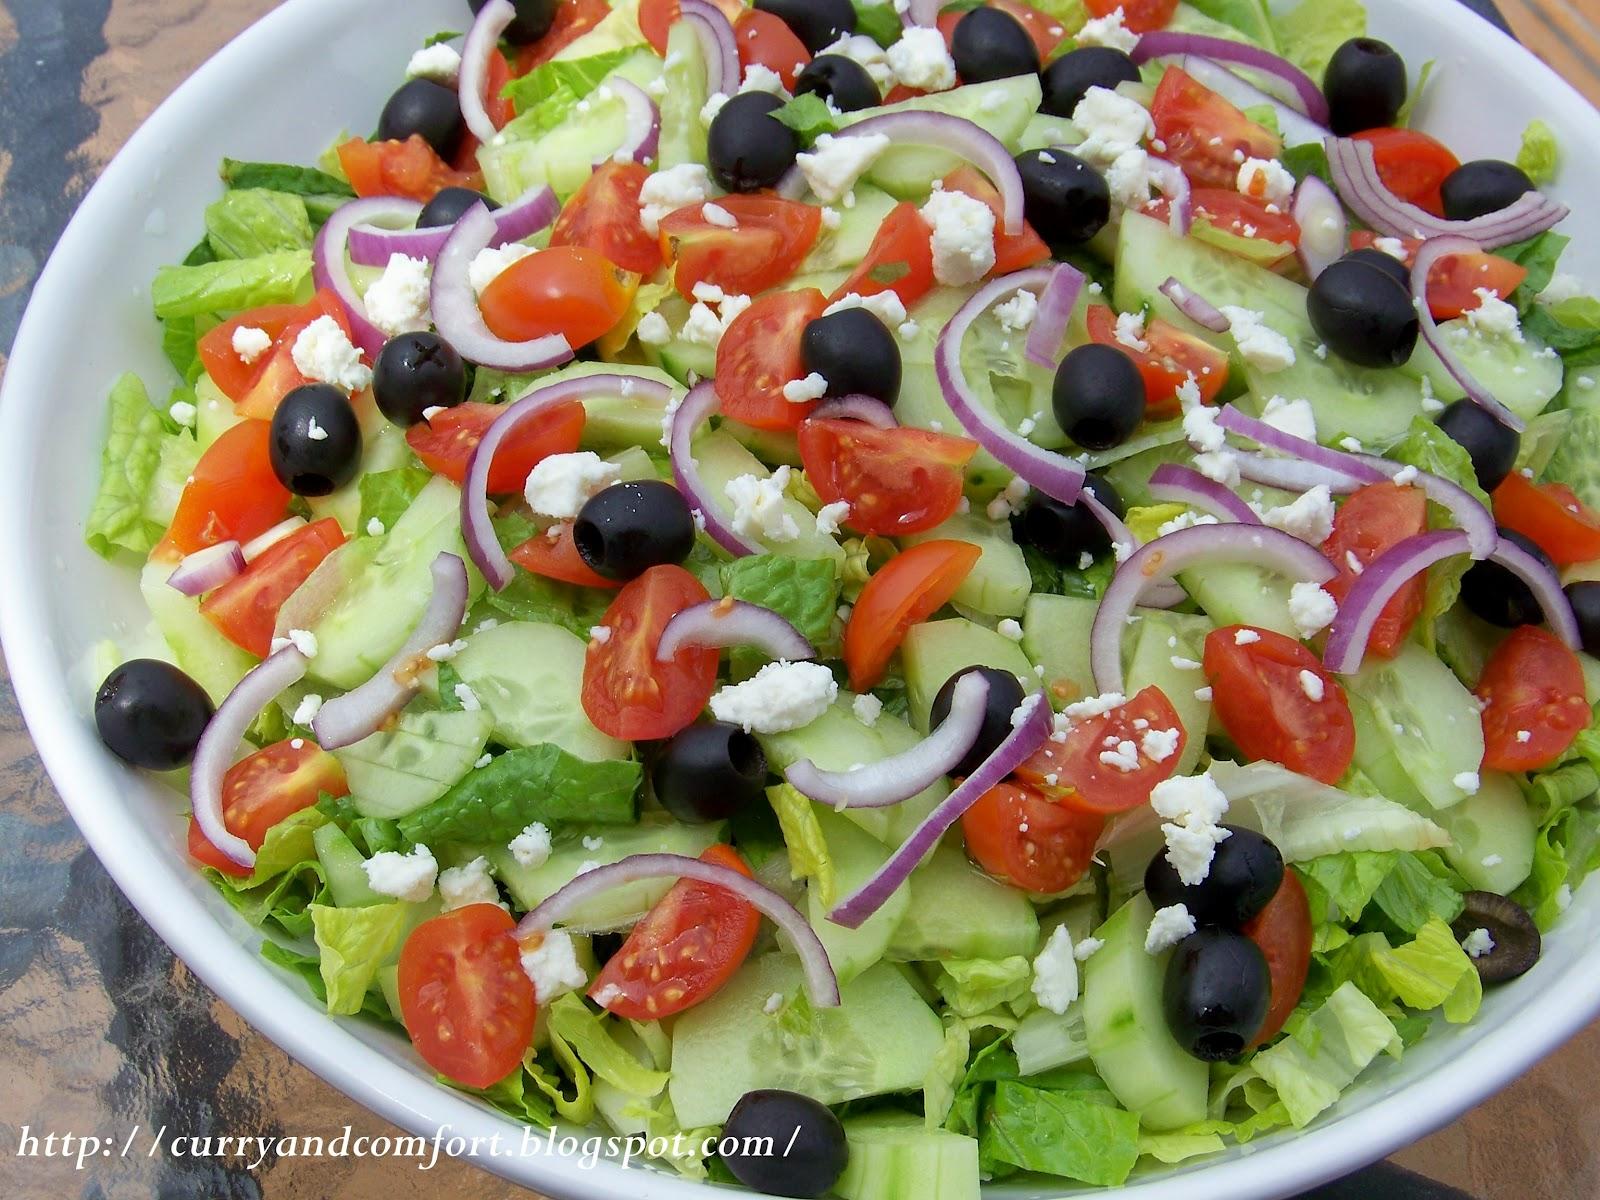 Greek Salad with Creamy Dressing